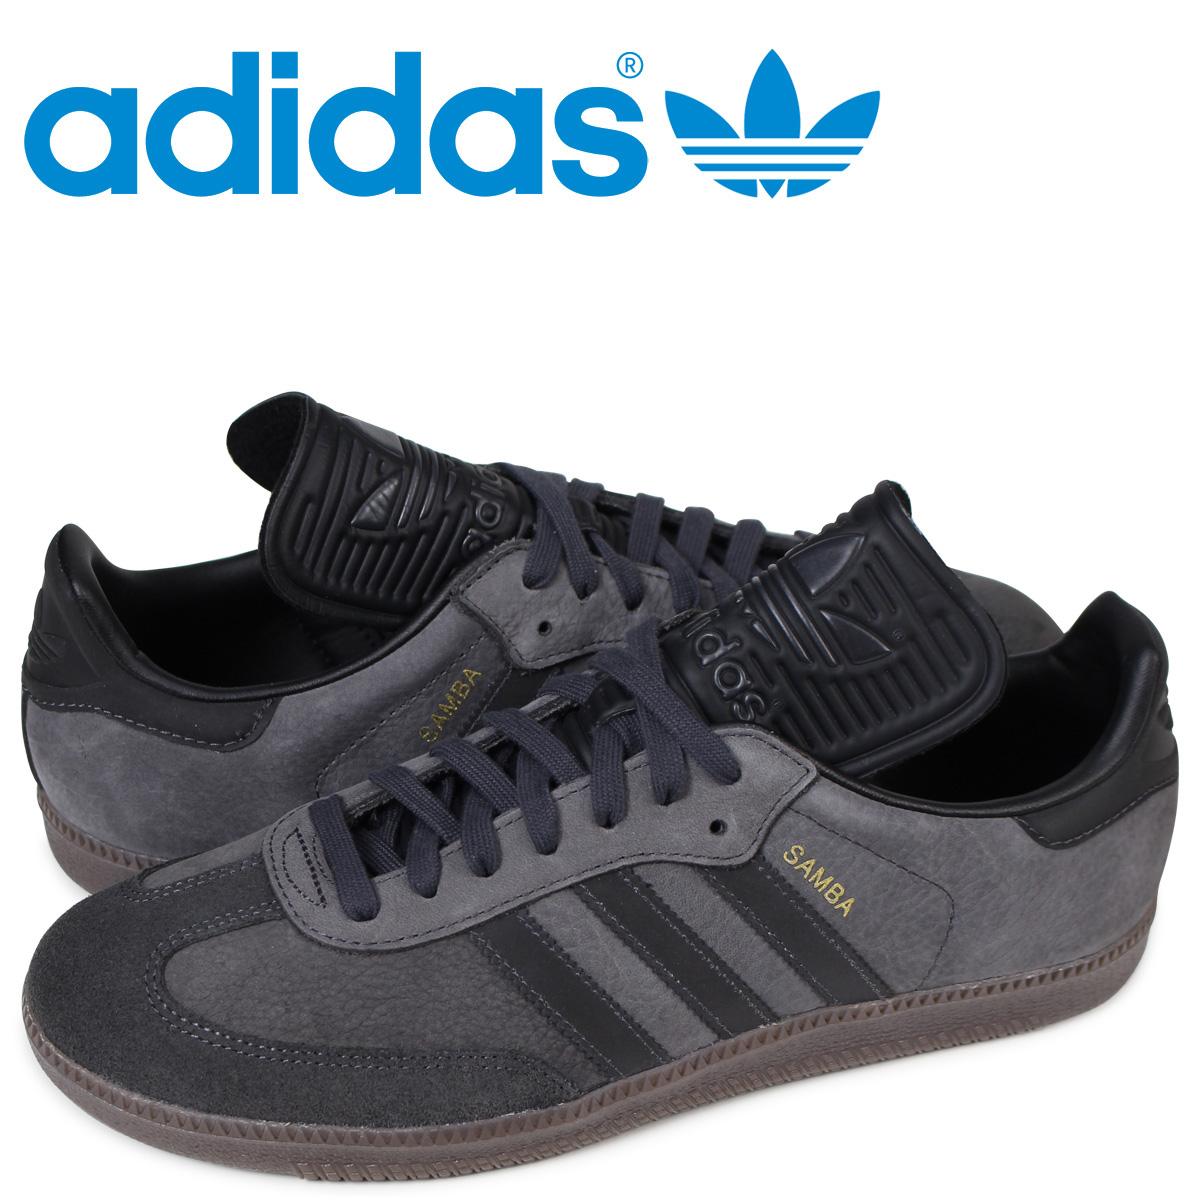 104df647c97 SneaK Online Shop  Adidas samba adidas Originals sneakers SAMBA ...